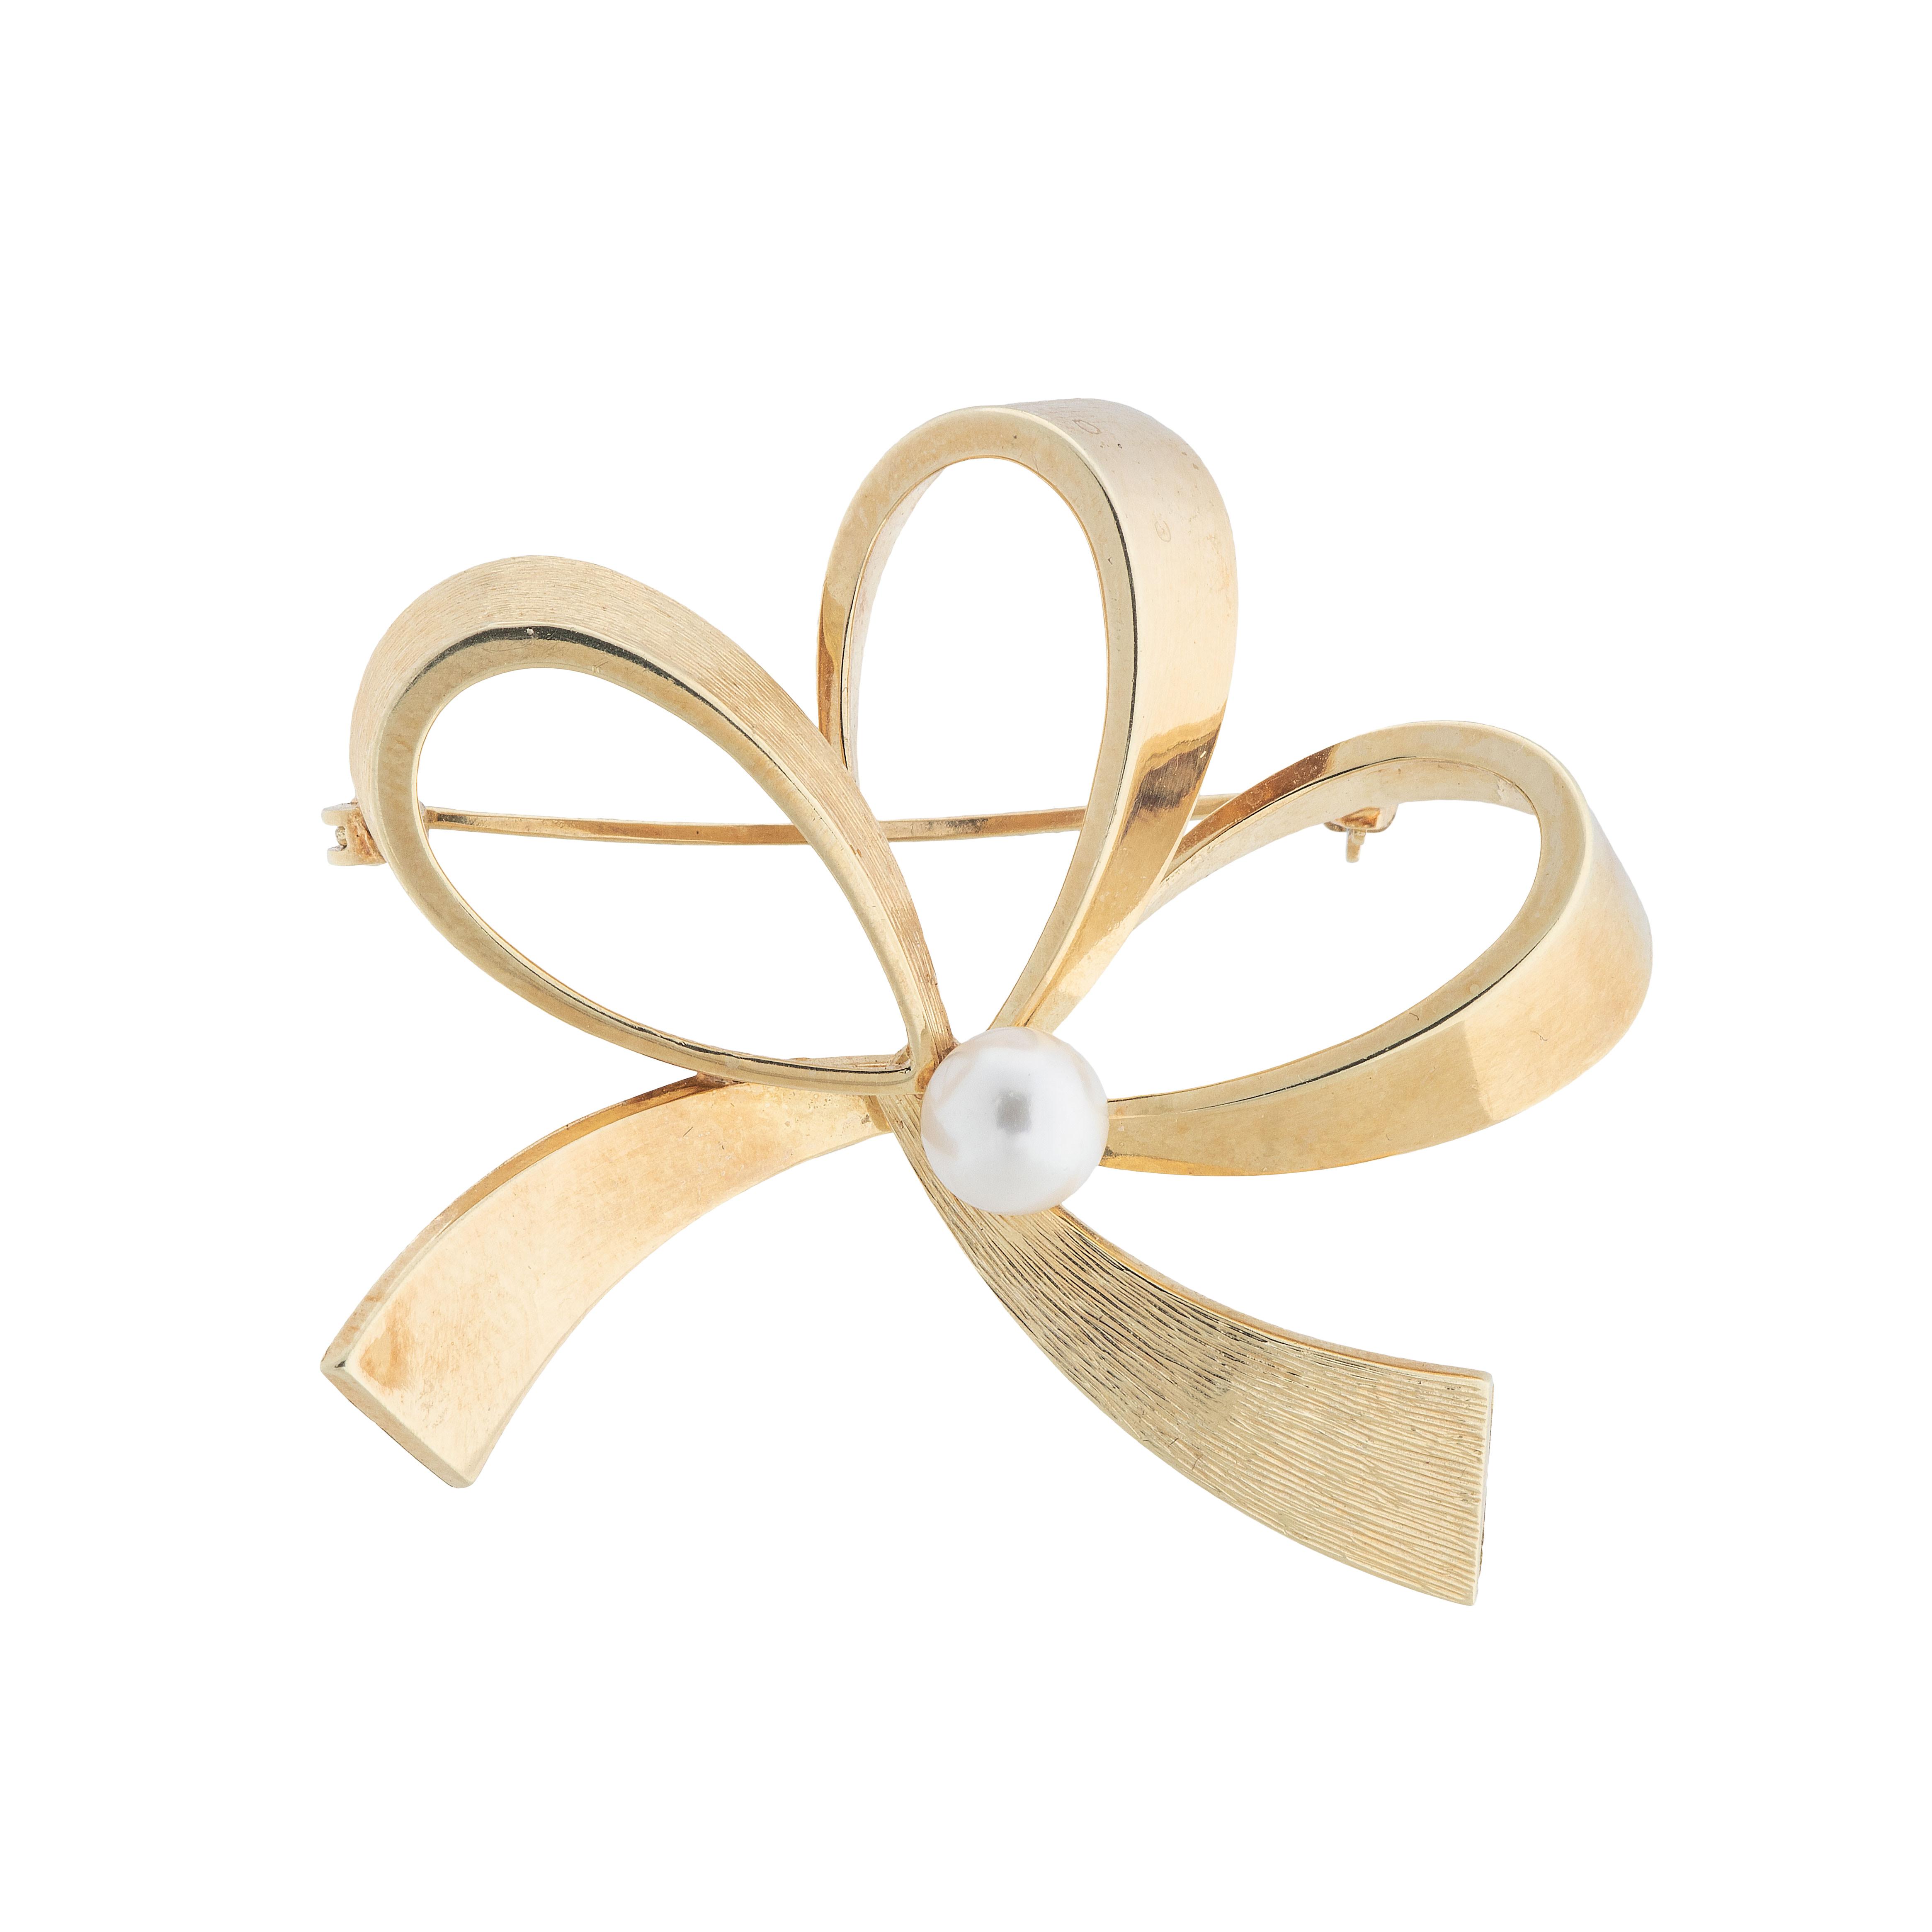 Sløyfebrosje, gult gull, perle